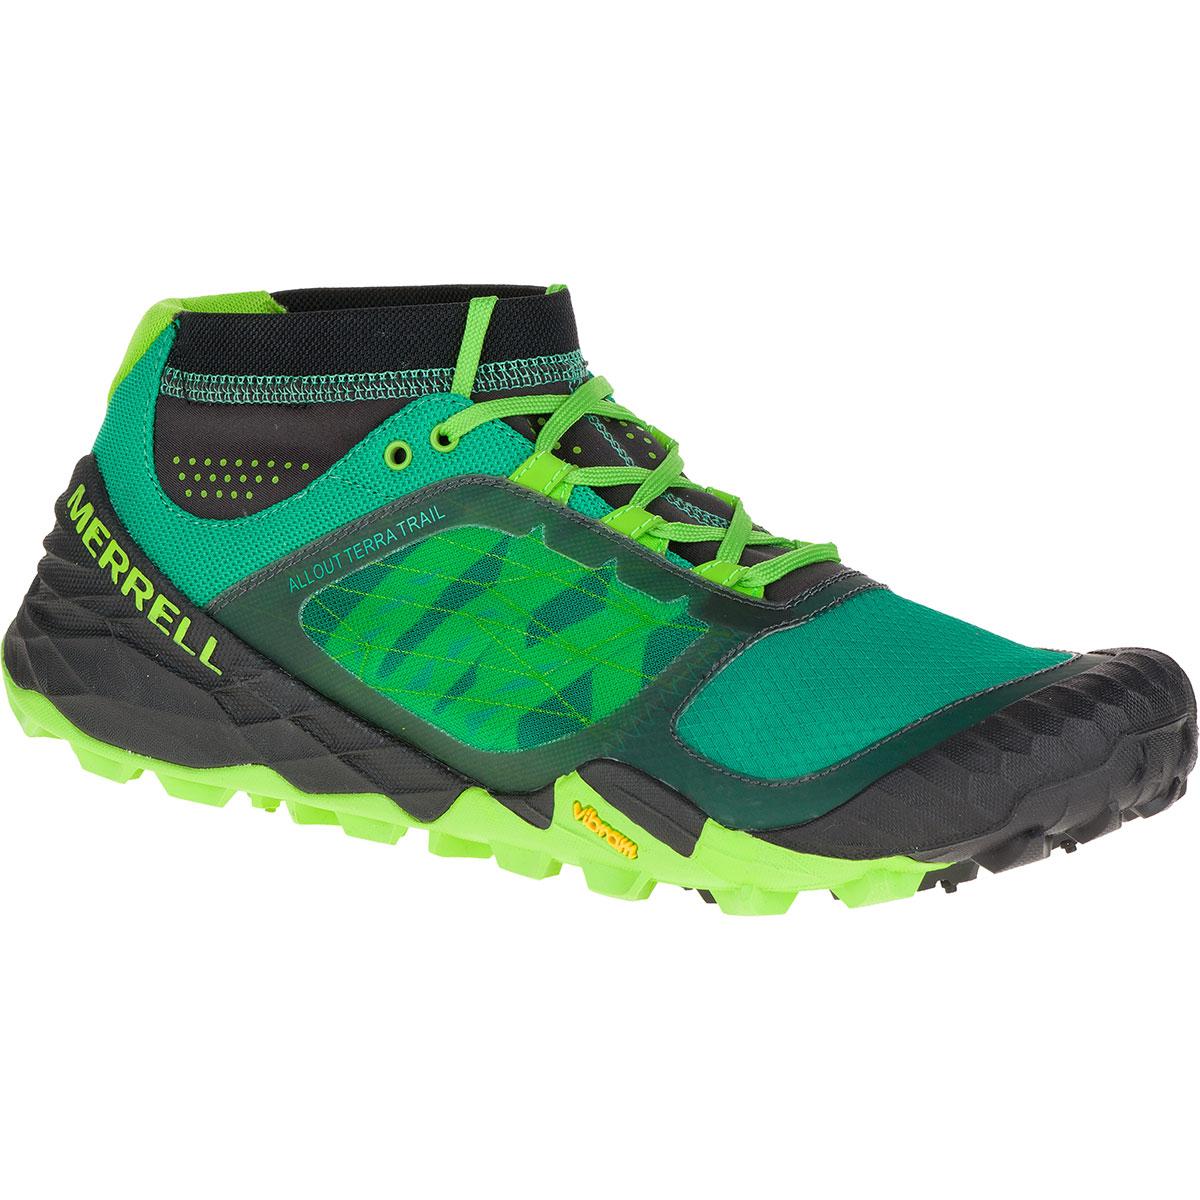 Terra Trail Running Shoes, Bright Green